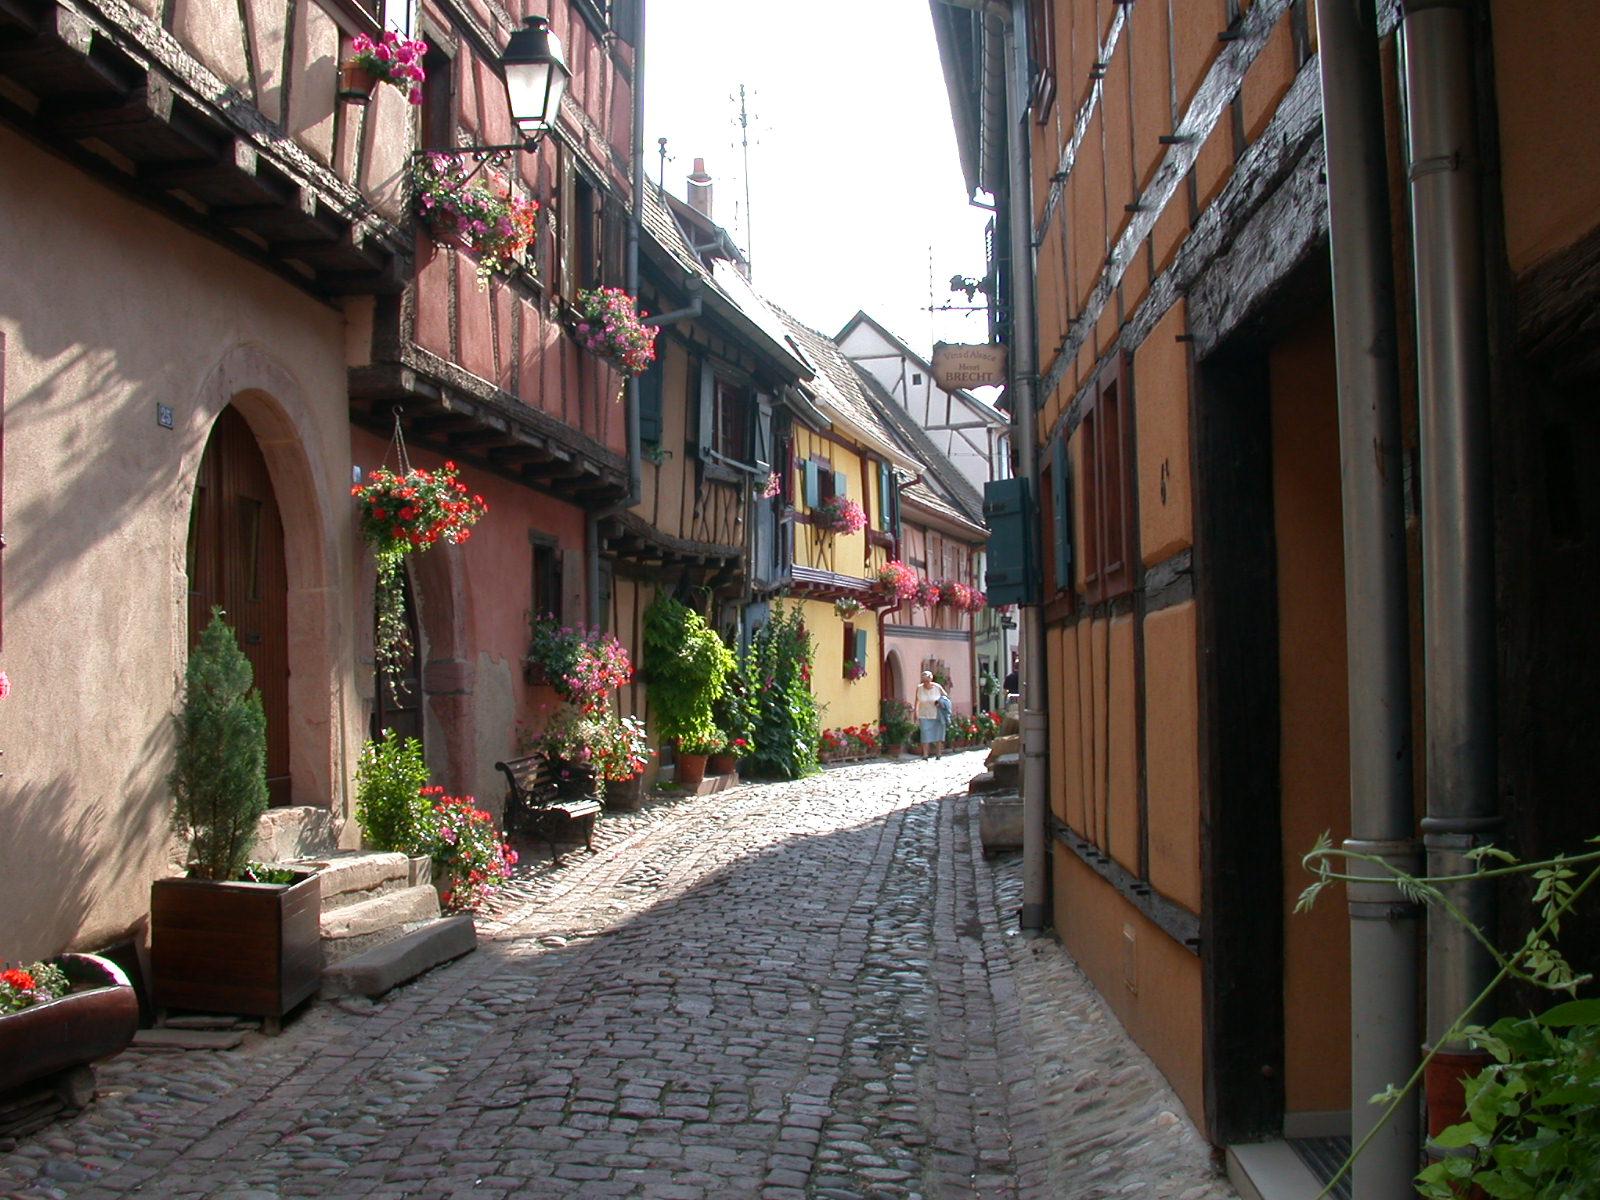 915-eguisheim-plus-beaux-villages-de-france-haut-rhin.jpg